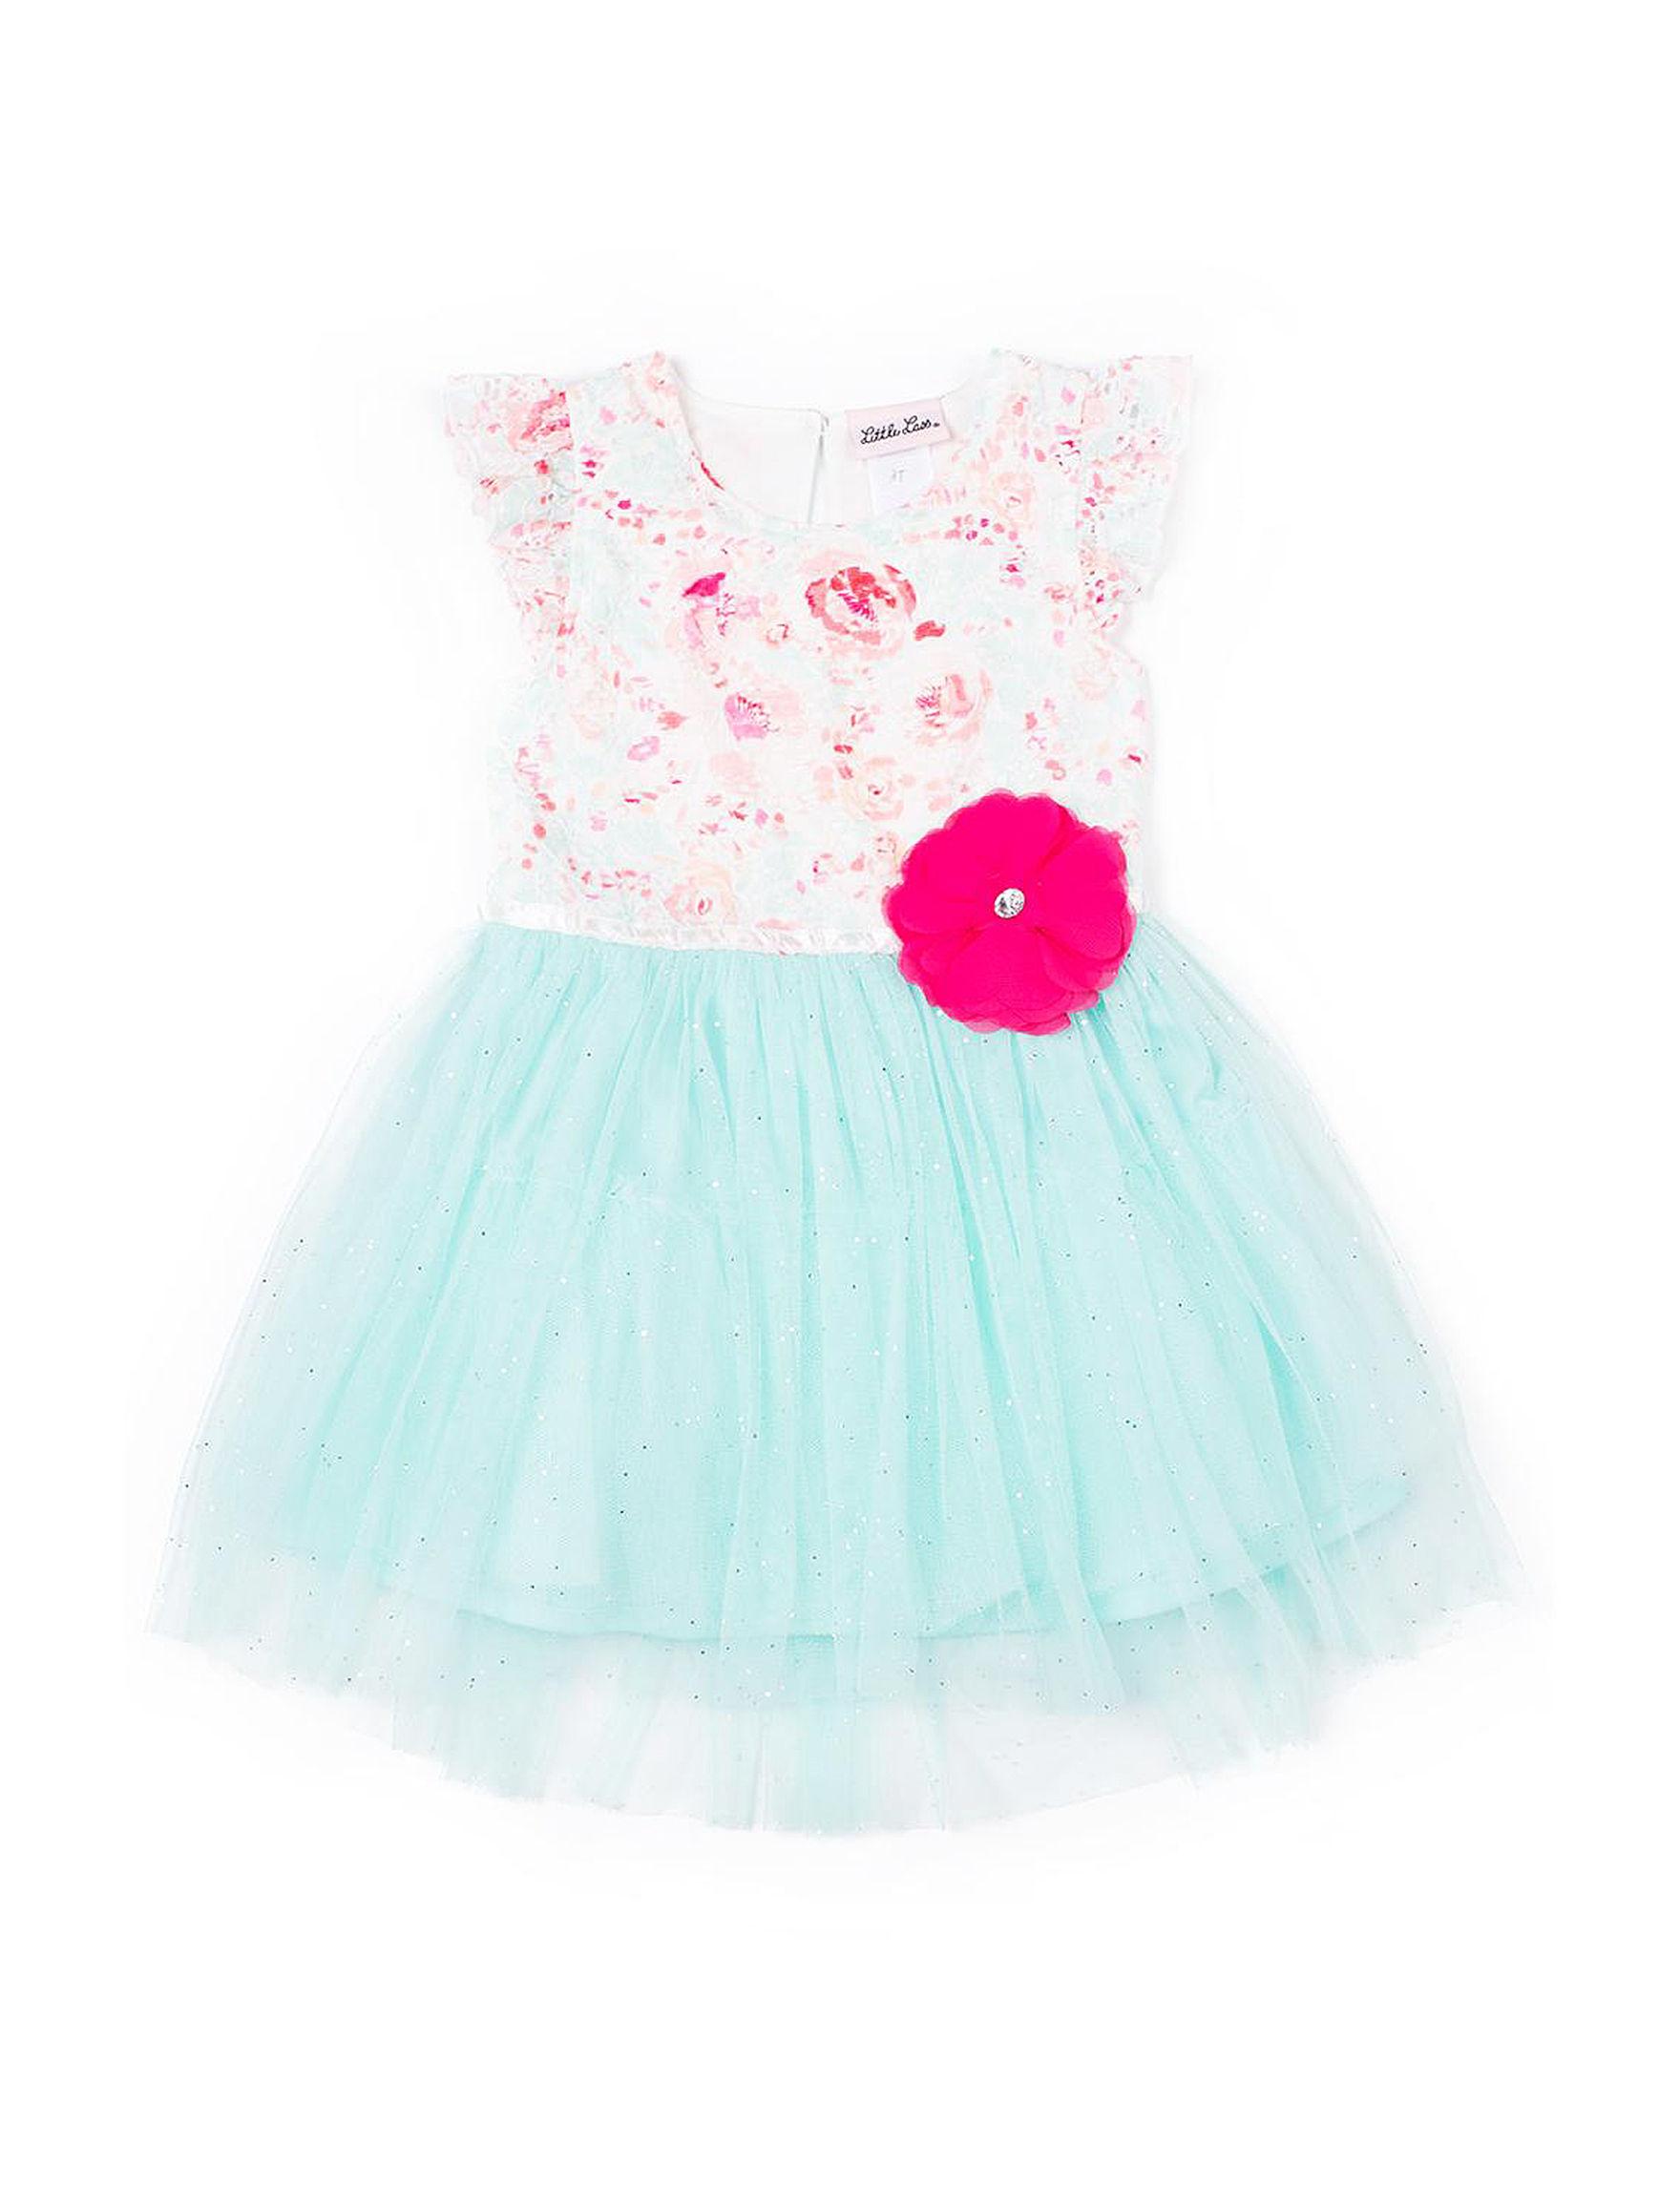 Little Lass White / Turquoise